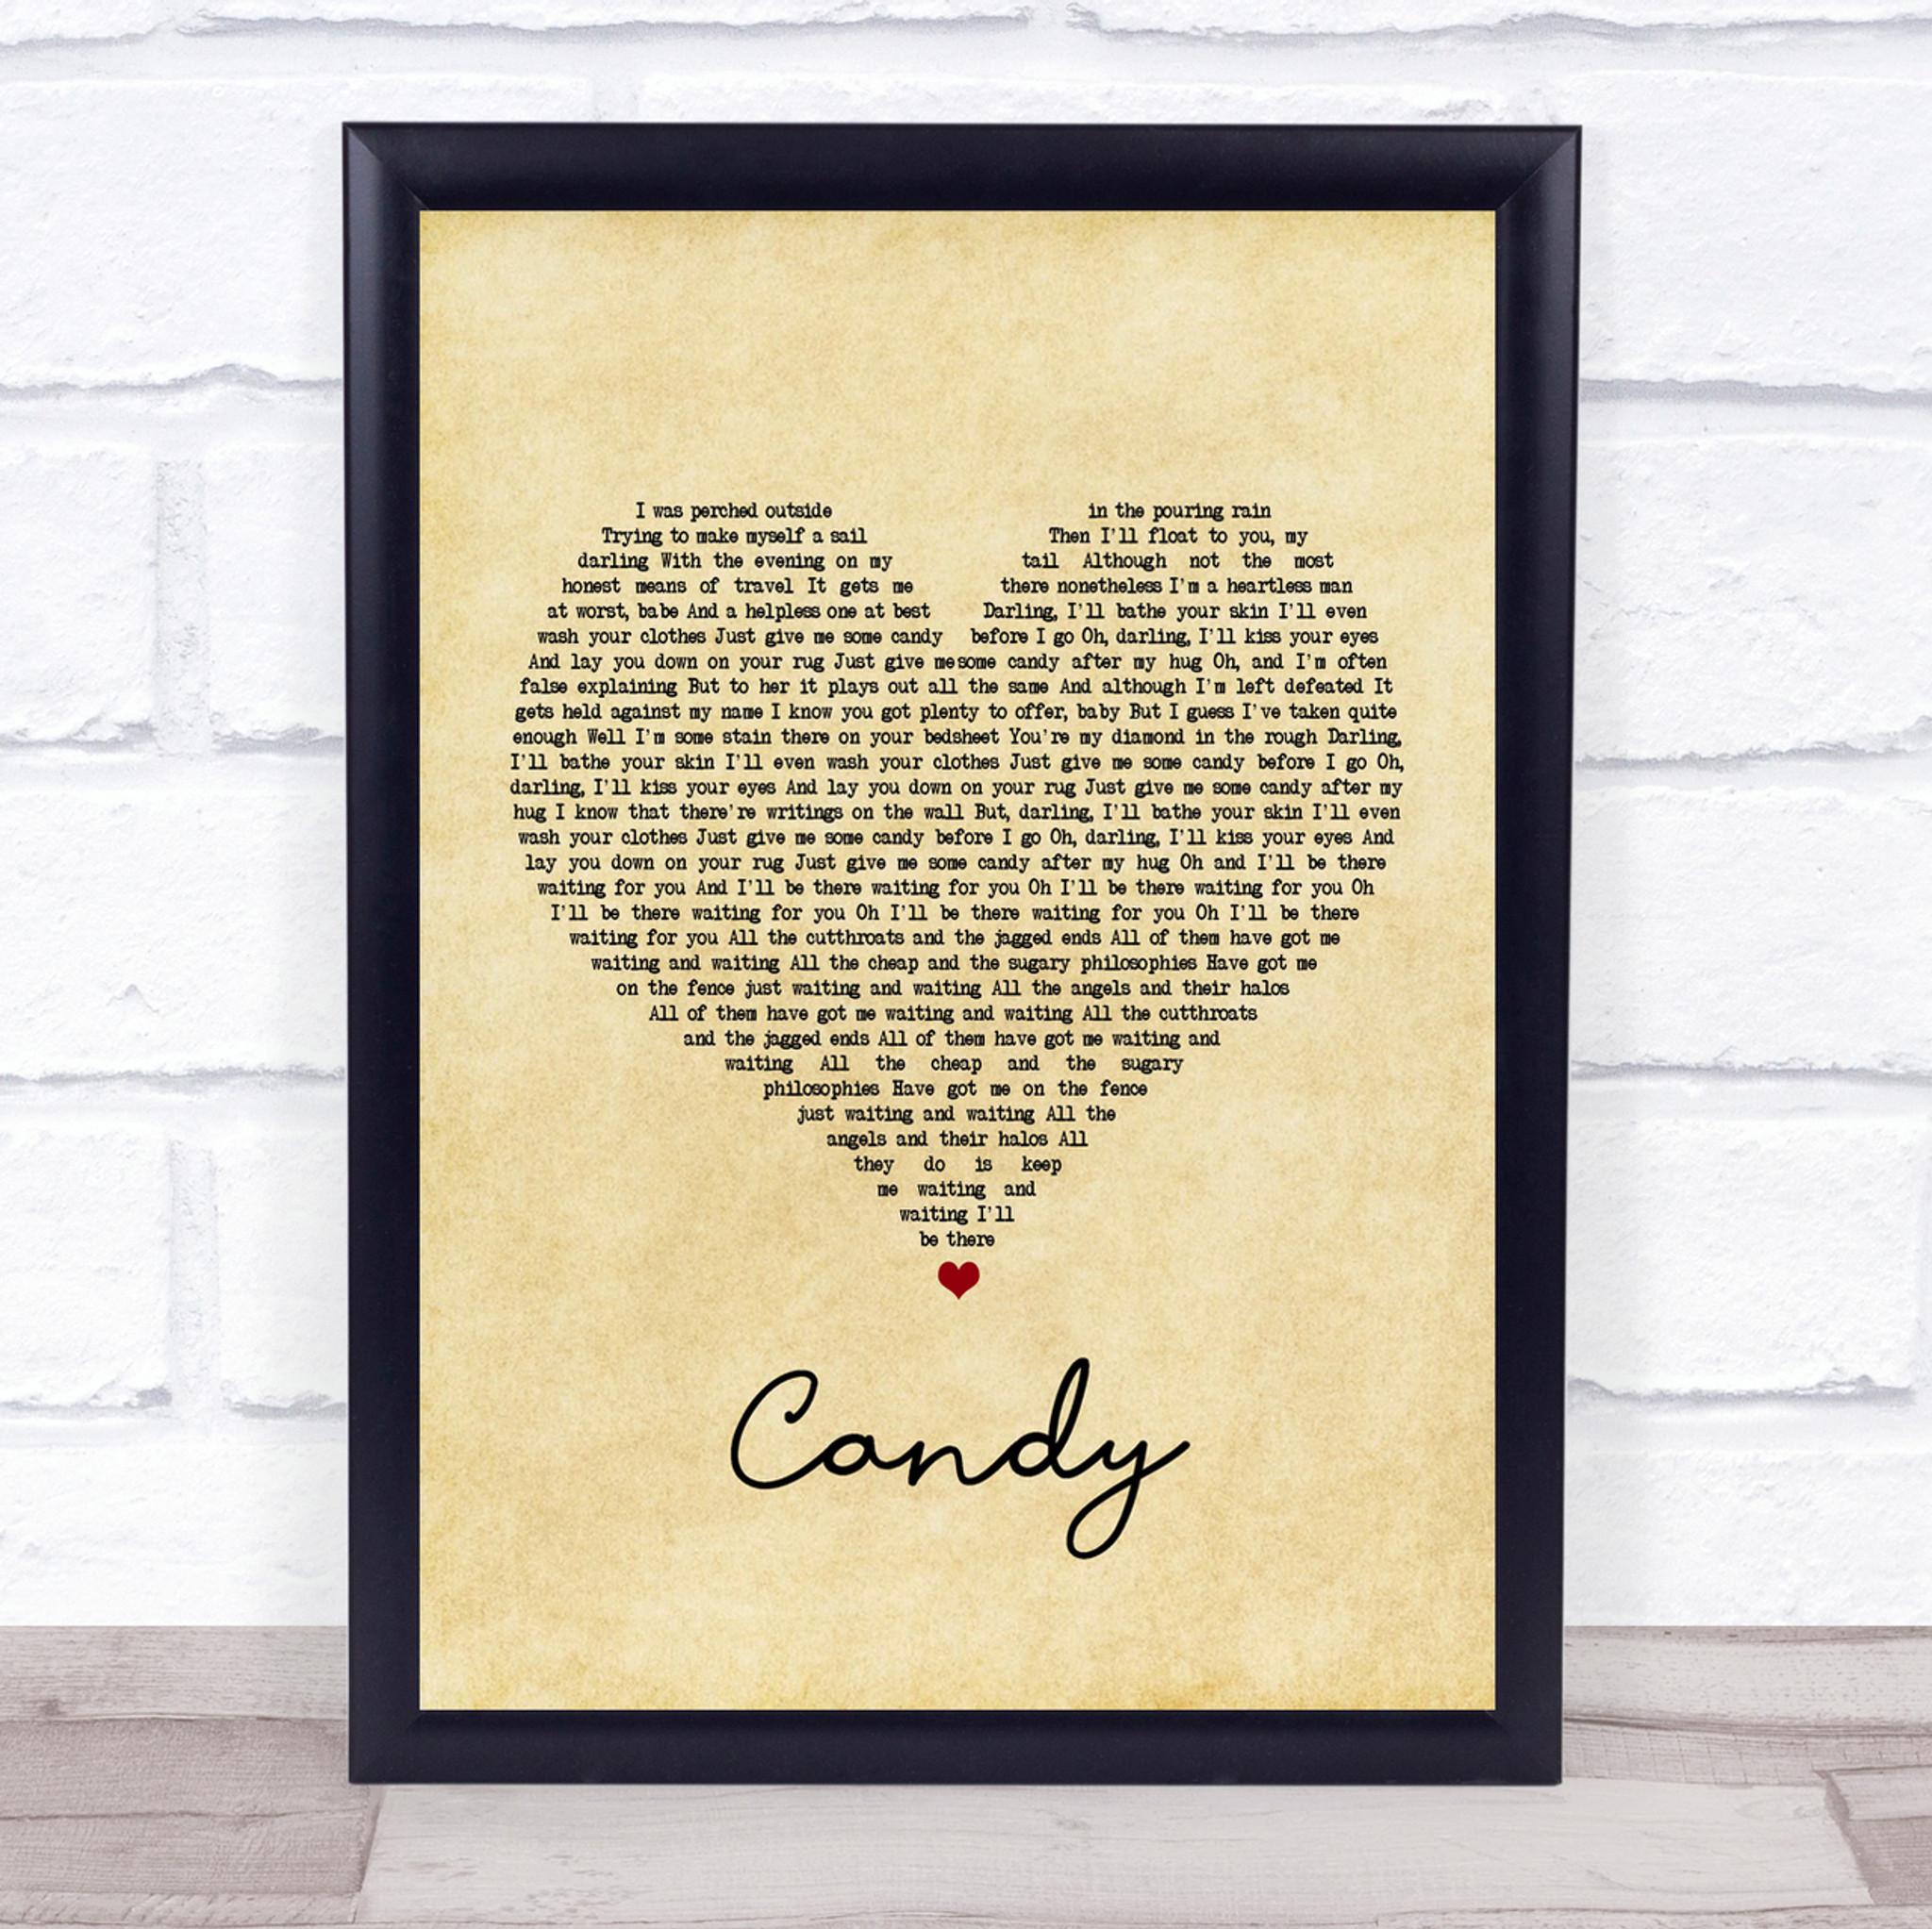 CANDY PAOLO NUTINI Wedding Anniversary Personalised First Dance Lyrics Art